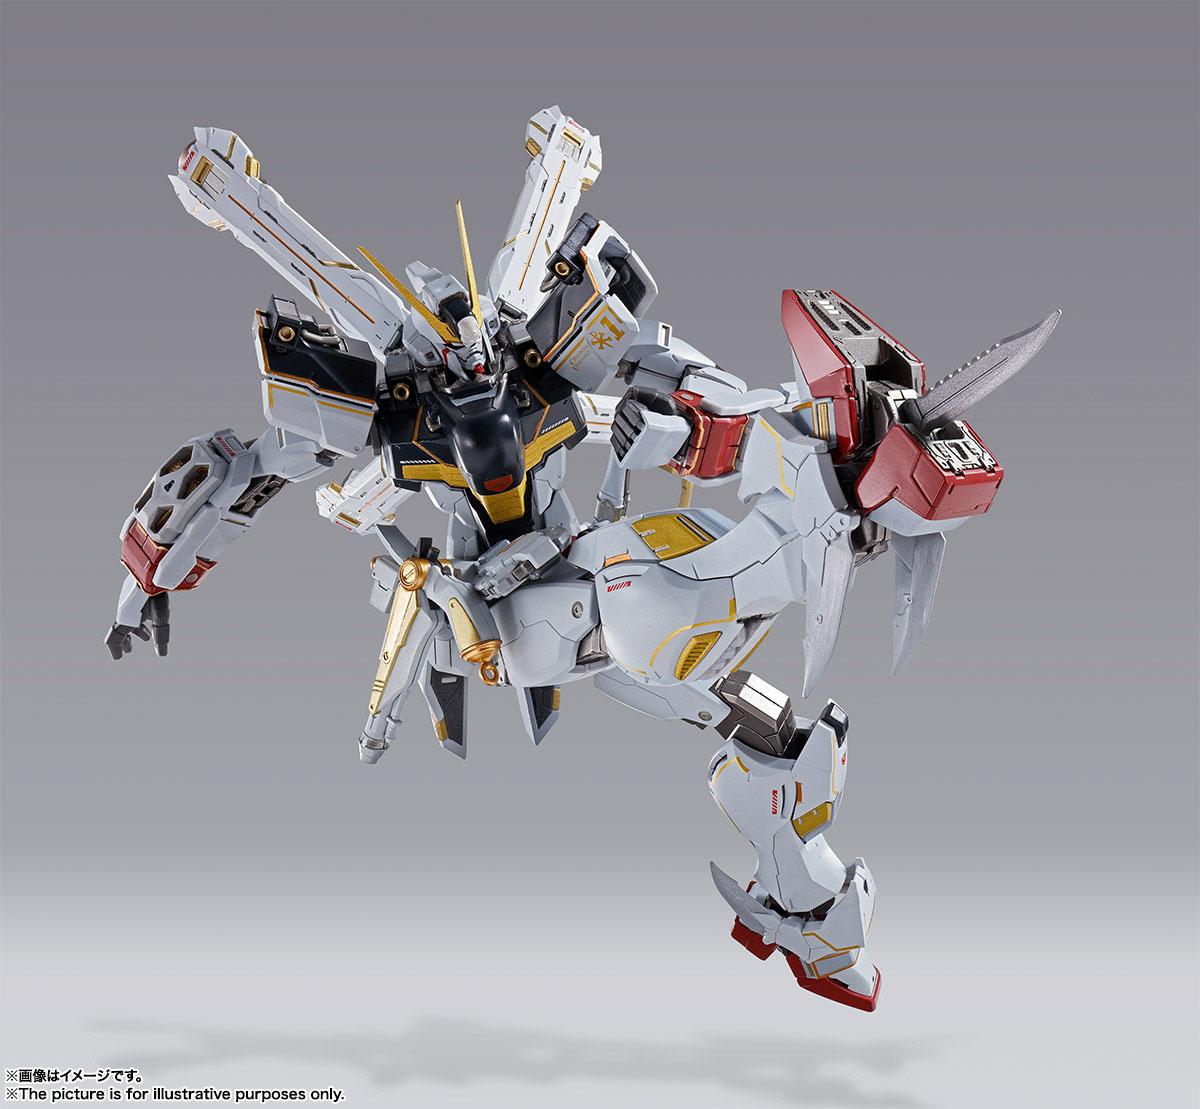 METAL BUILD『クロスボーン・ガンダムX1』機動戦士クロスボーン・ガンダム 可動フィギュア-007